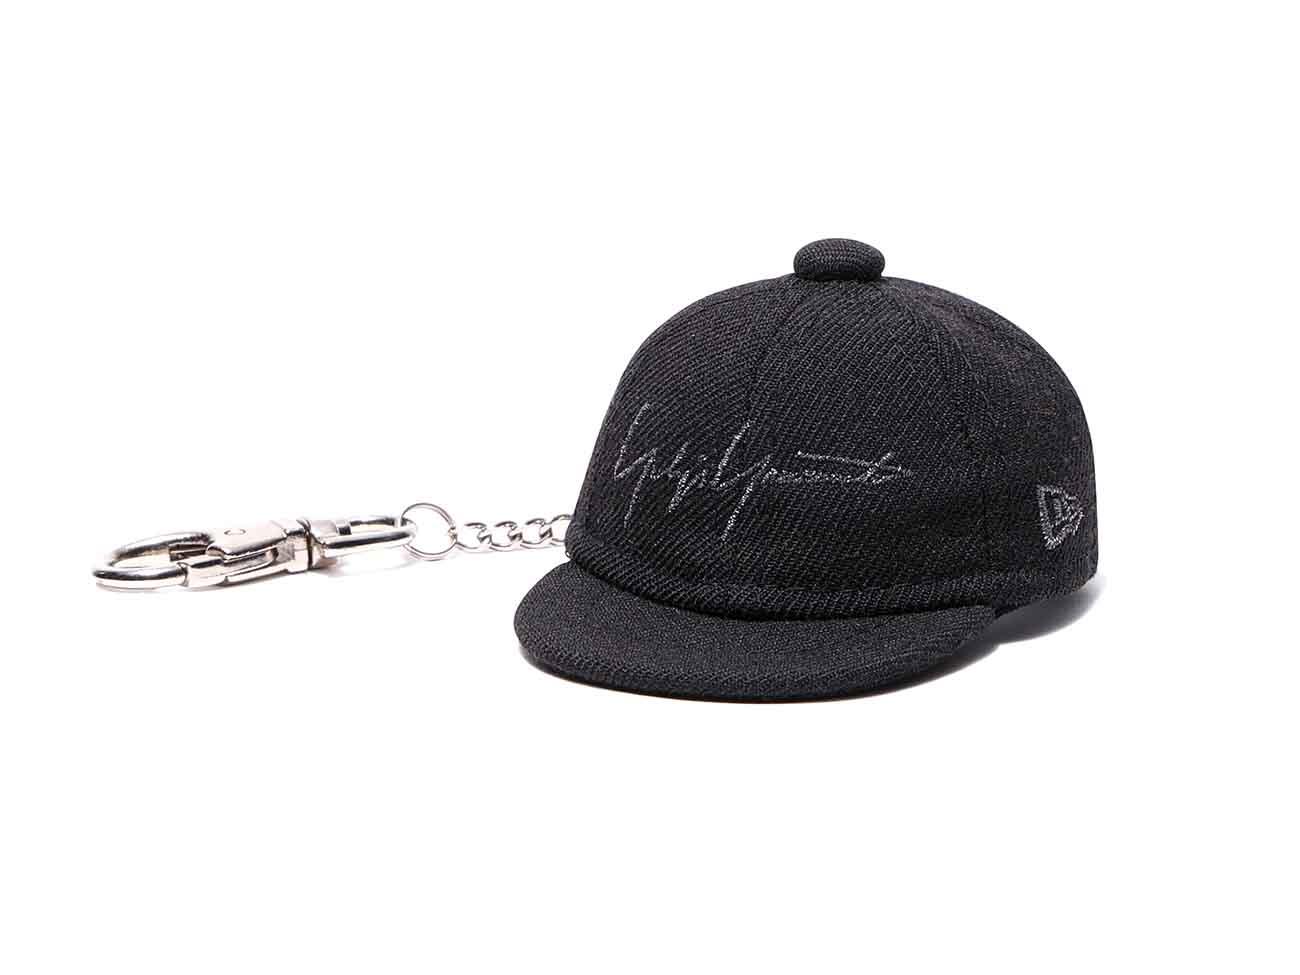 Yohji Yamamoto × New Era BLACK SERGE CAP KEYHOLDER BLACK/BLACK